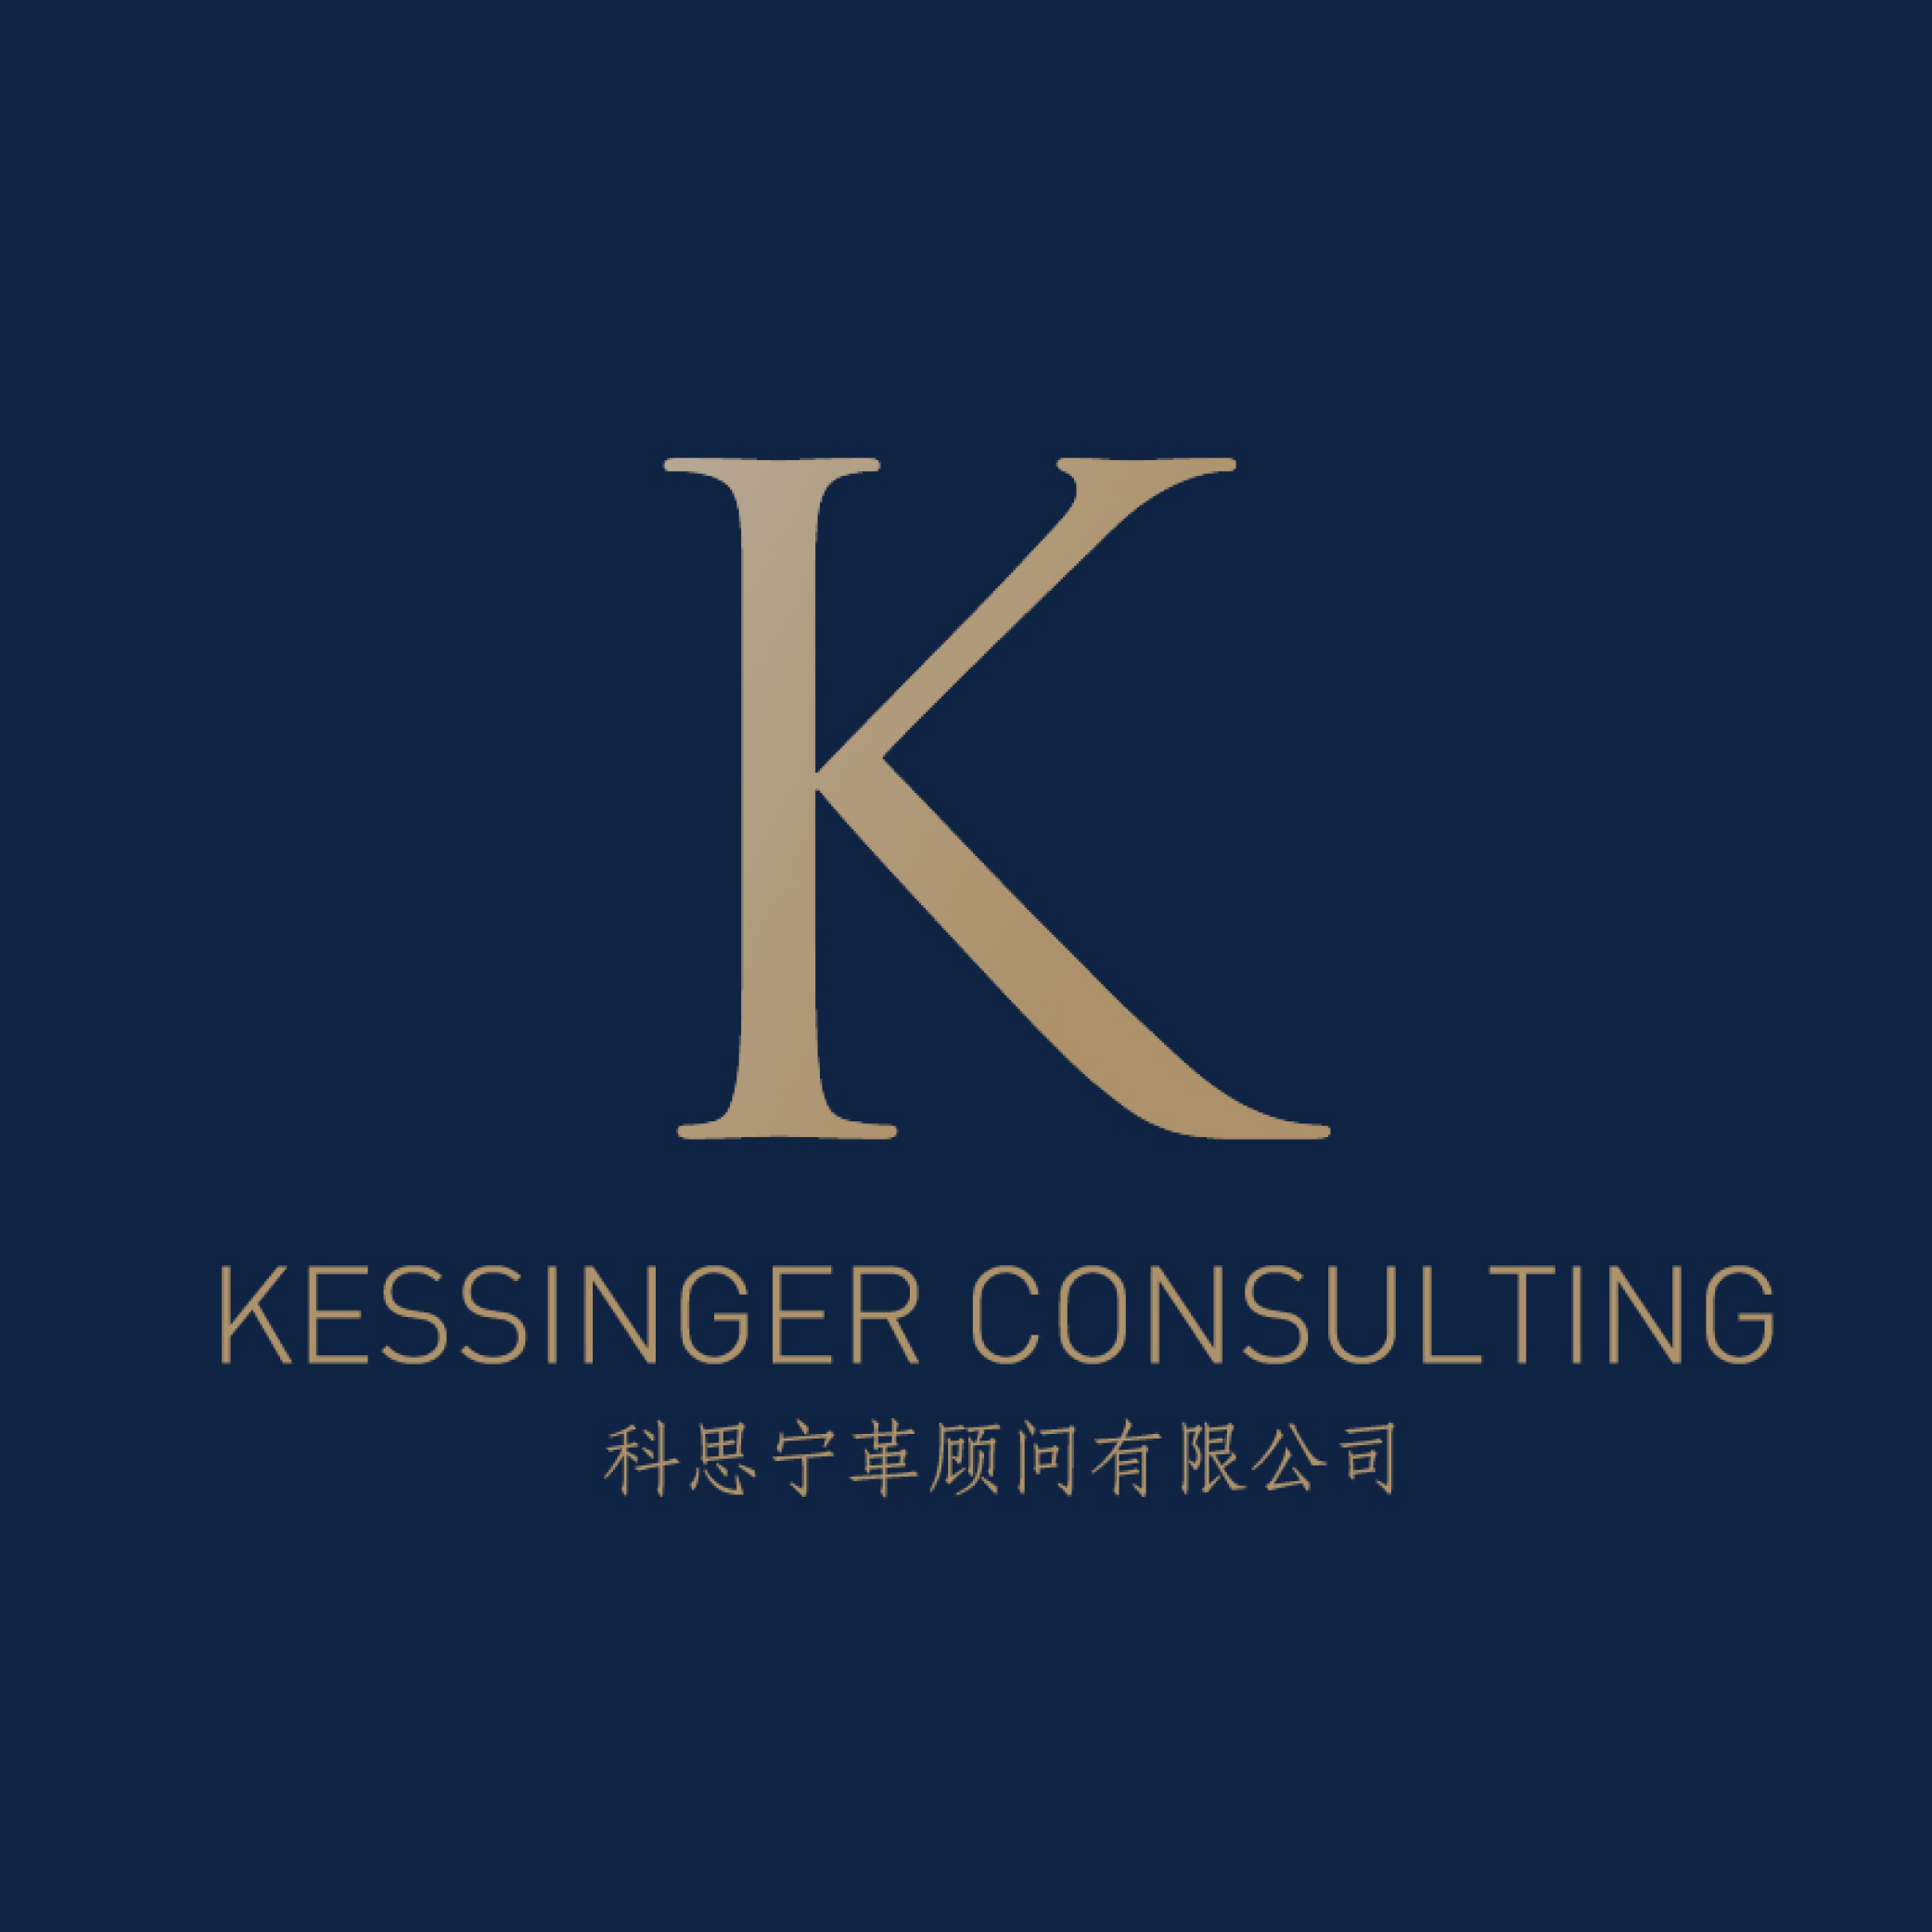 Kessinger Consulting